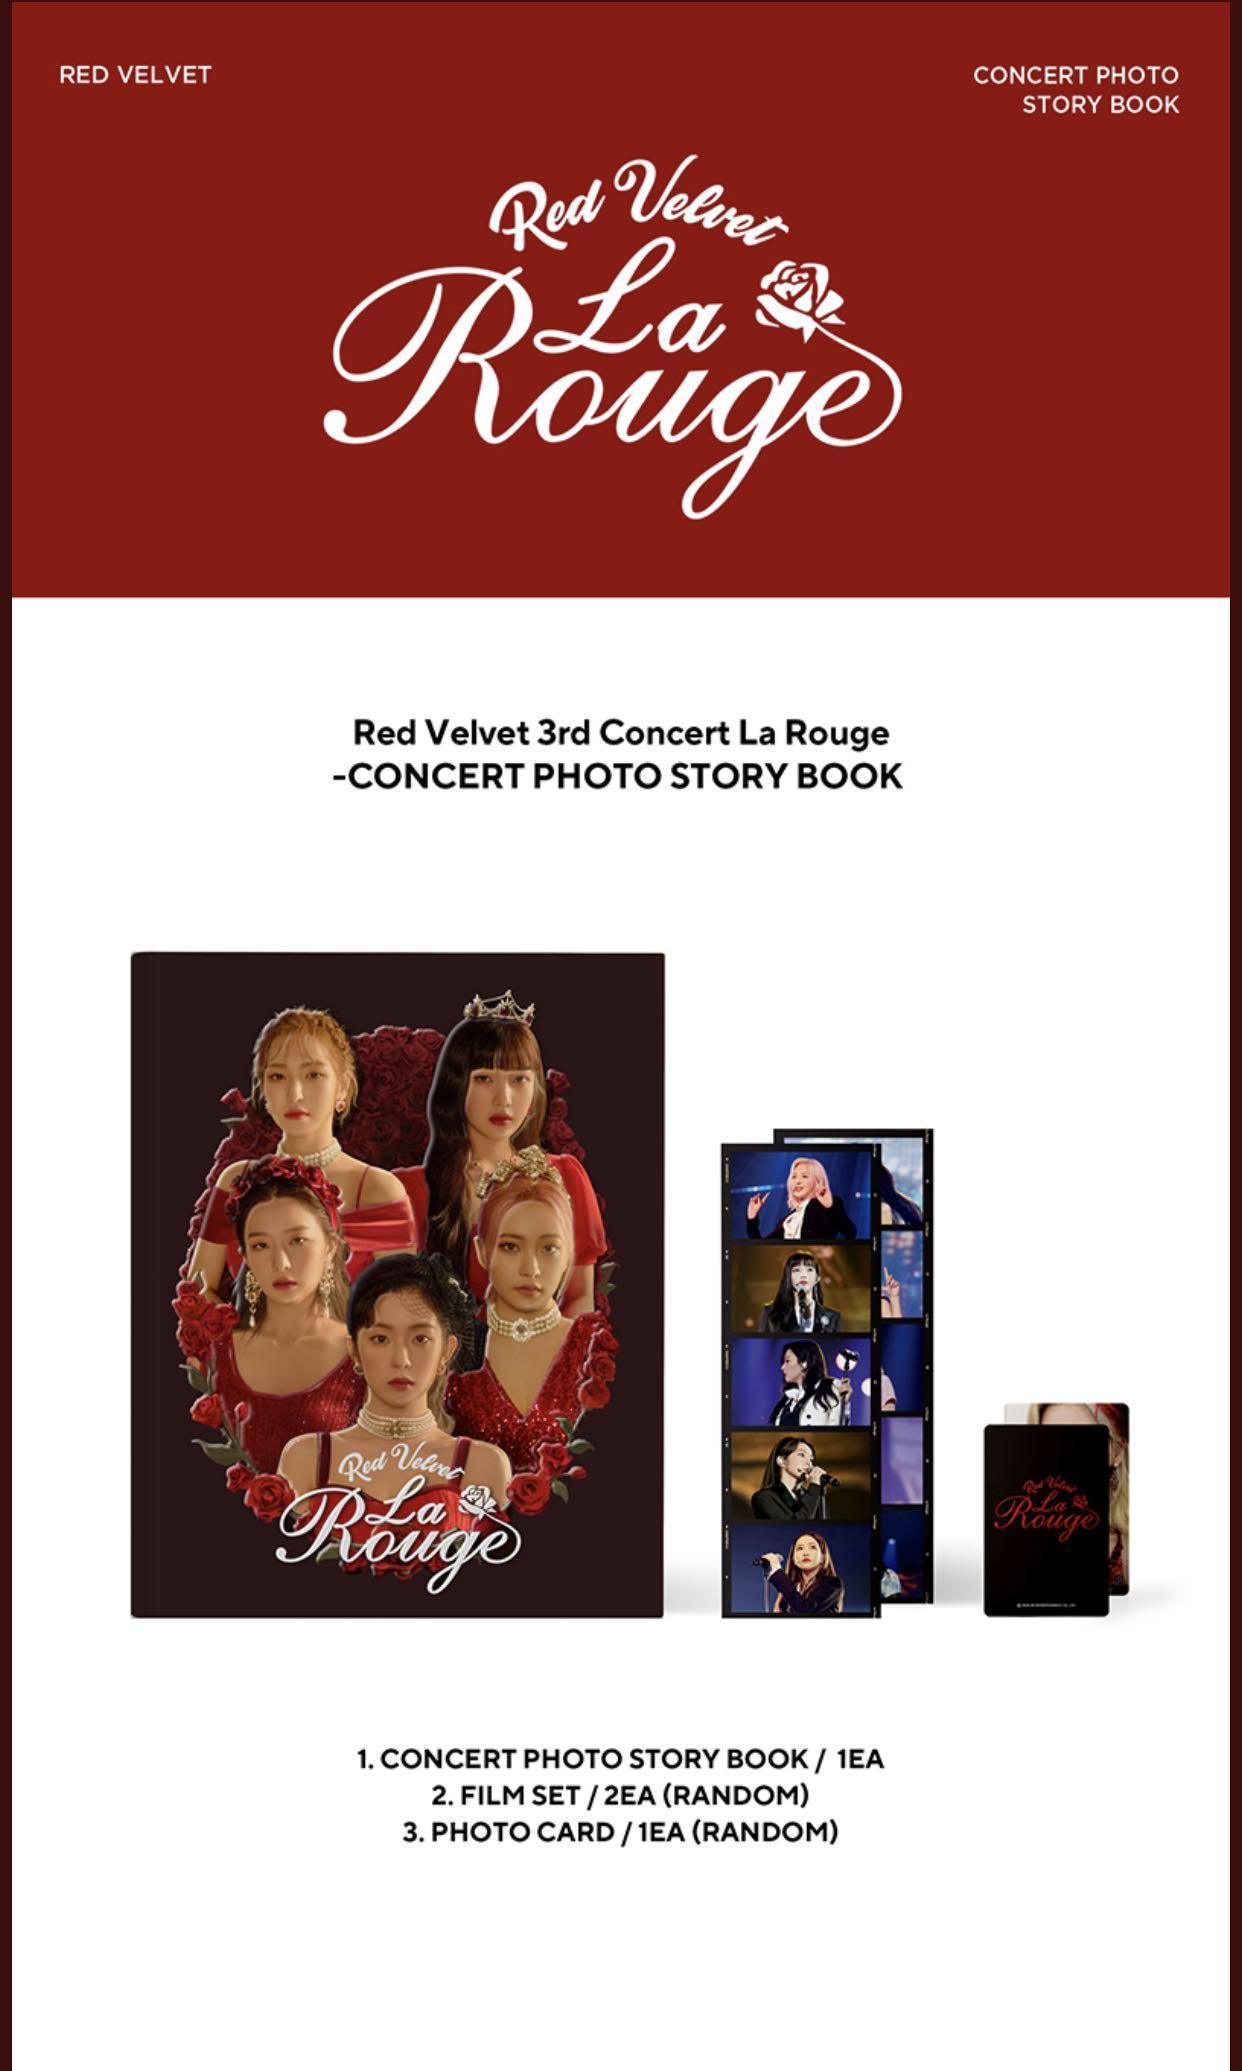 [PO]Red Velvet 3rd Concert La Rouge Photobook & Live Album